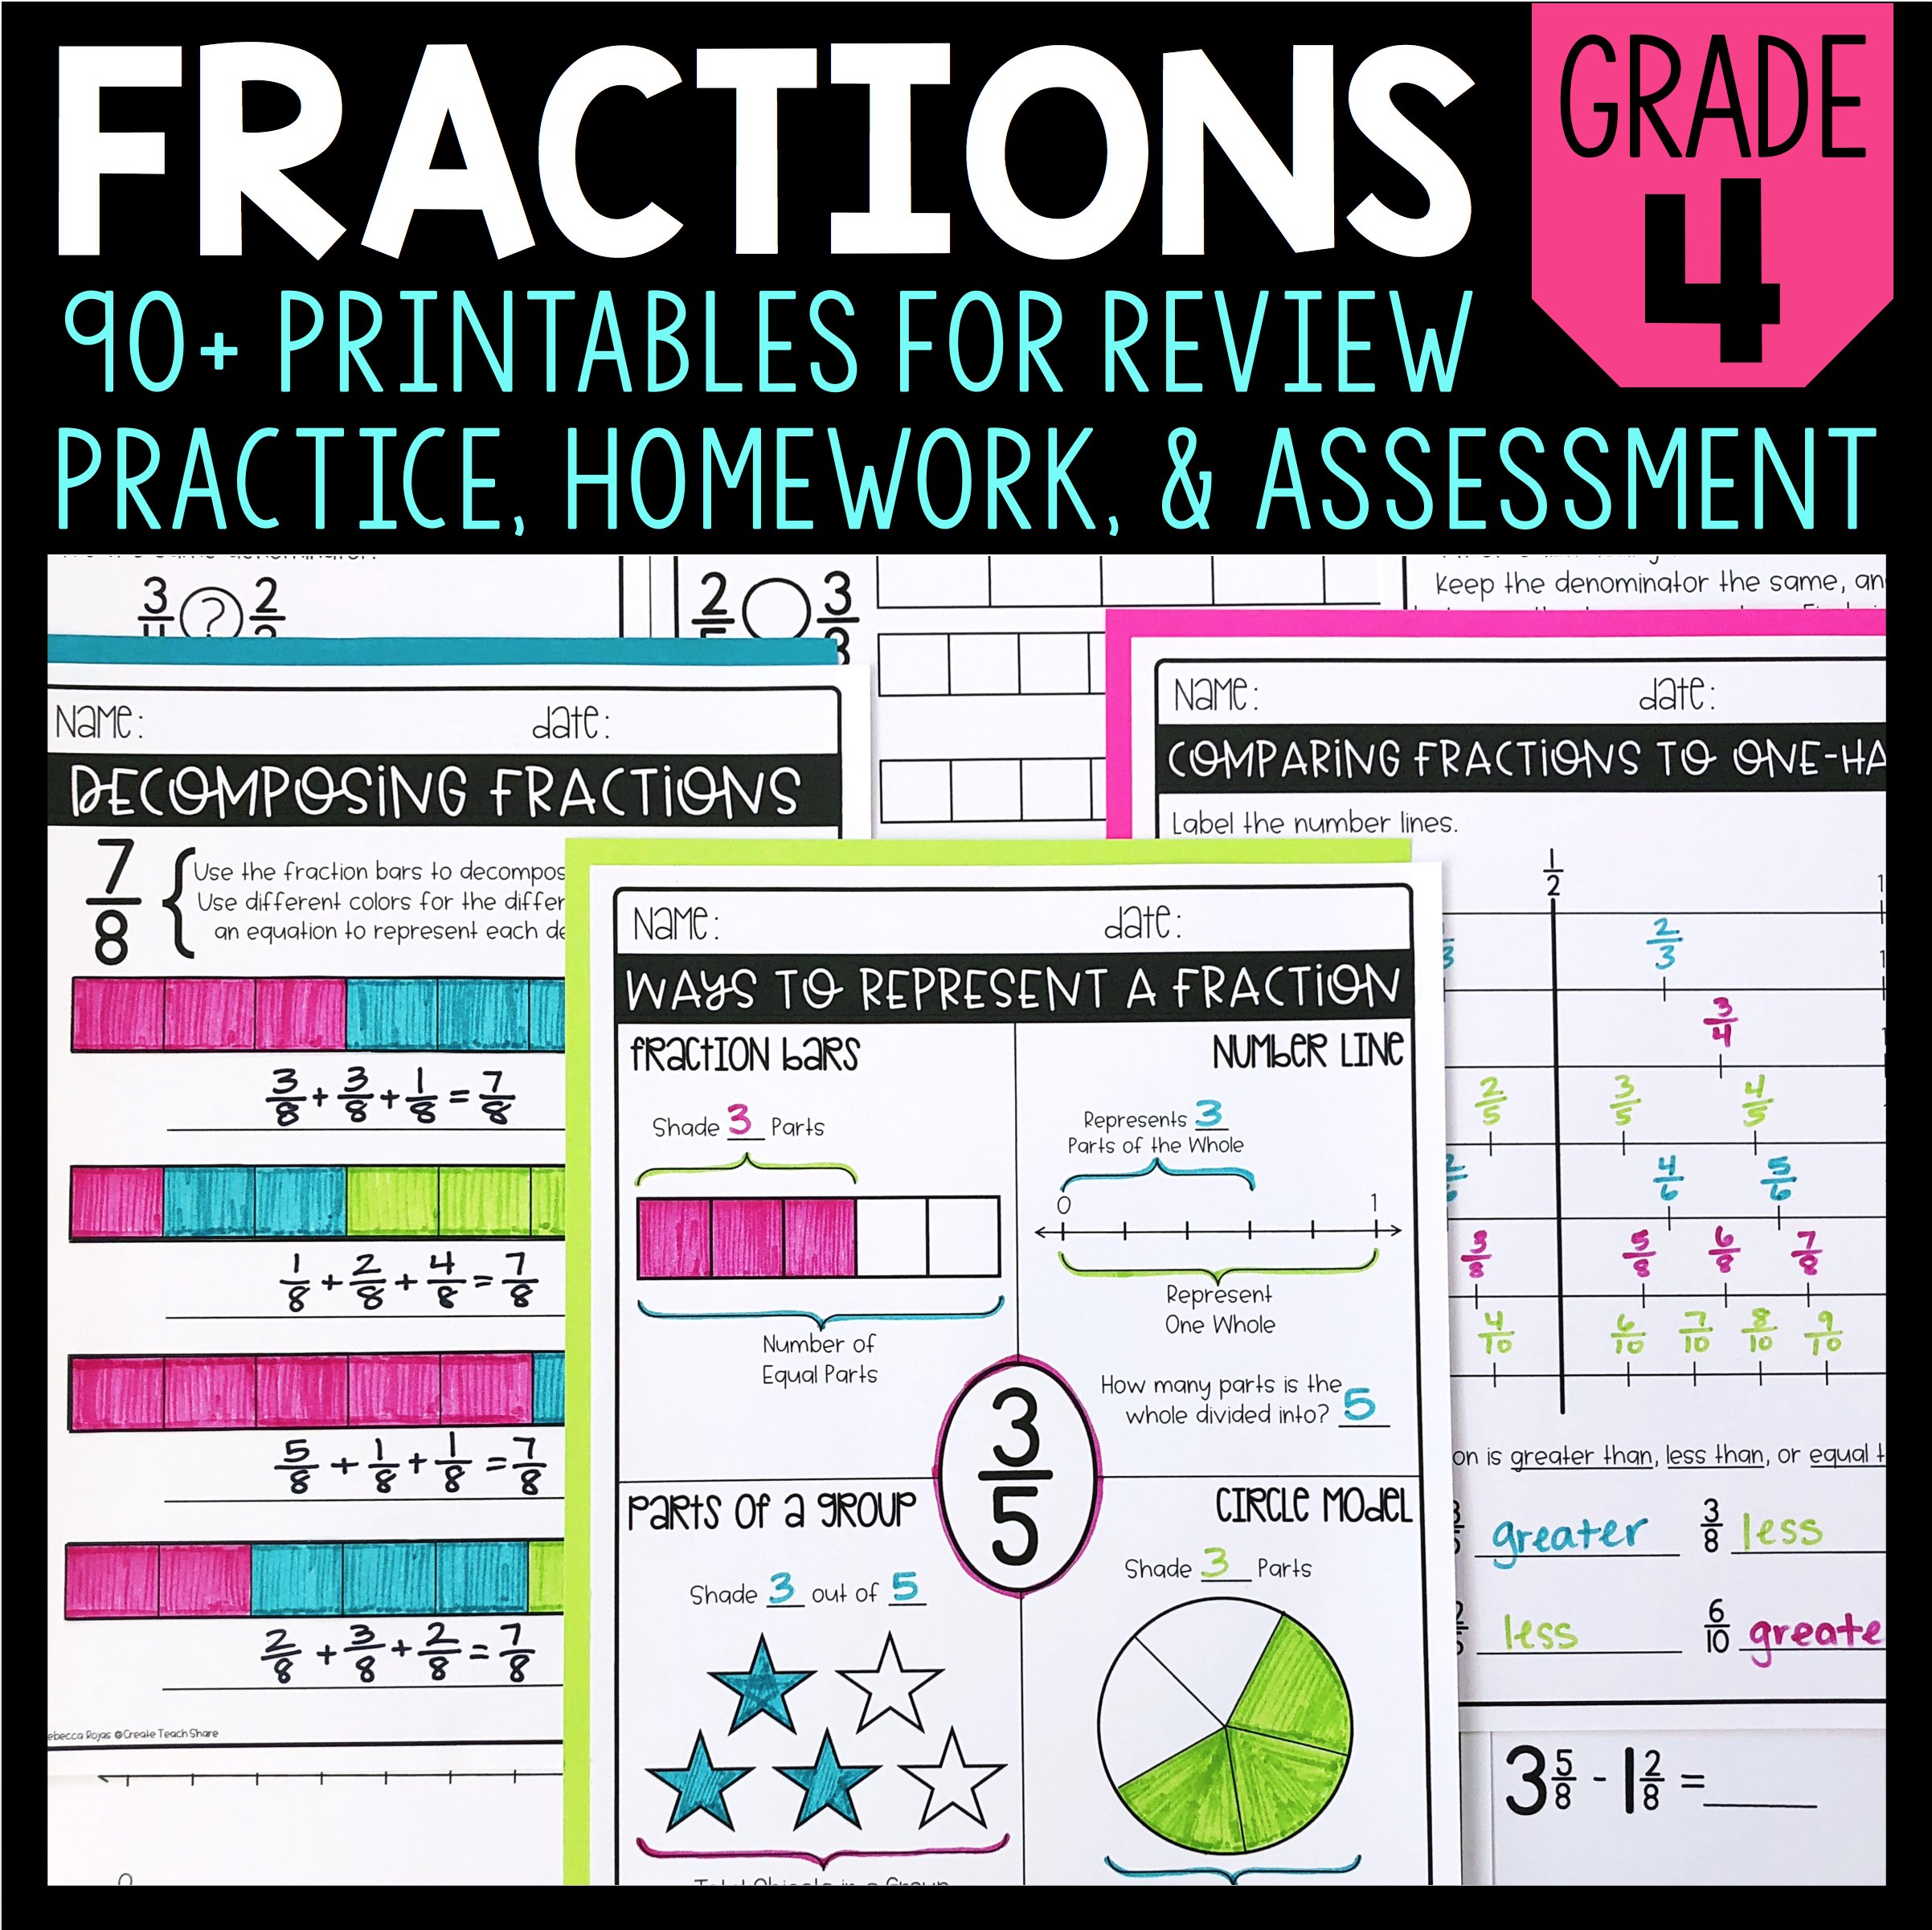 80 Fraction Printables